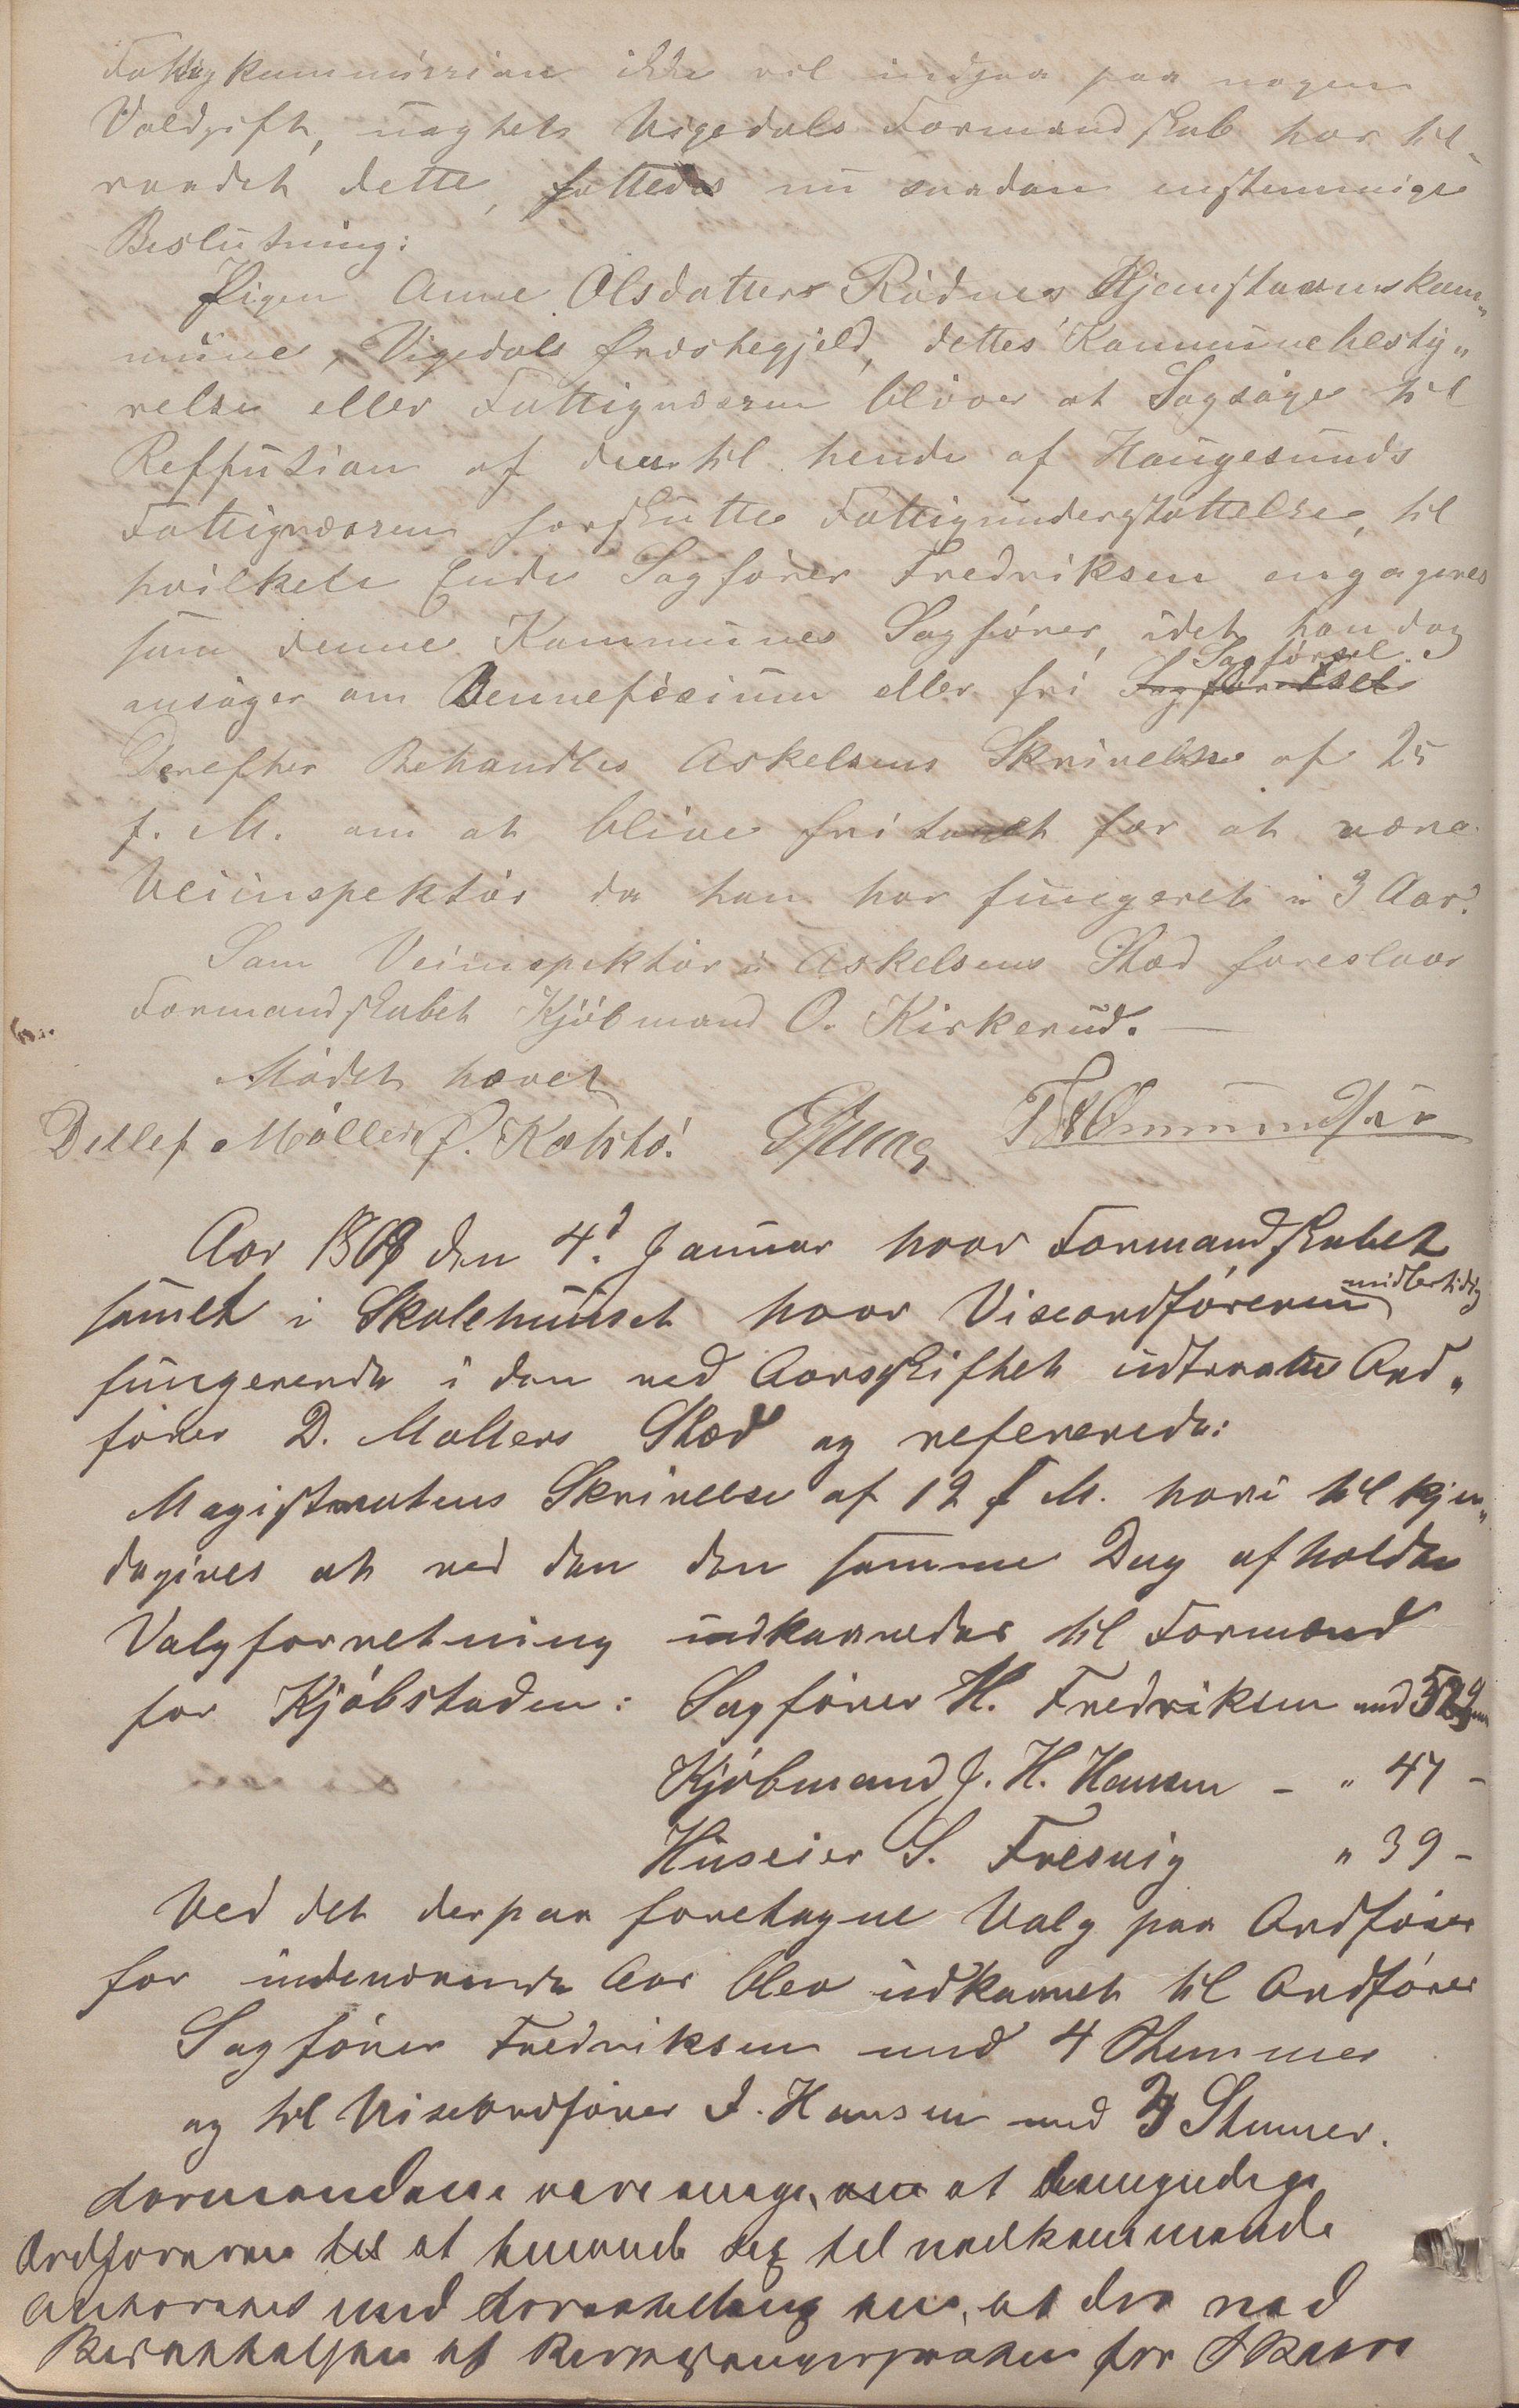 IKAR, Haugesund kommune - Formannskapet, 1866-1878, s. 34b